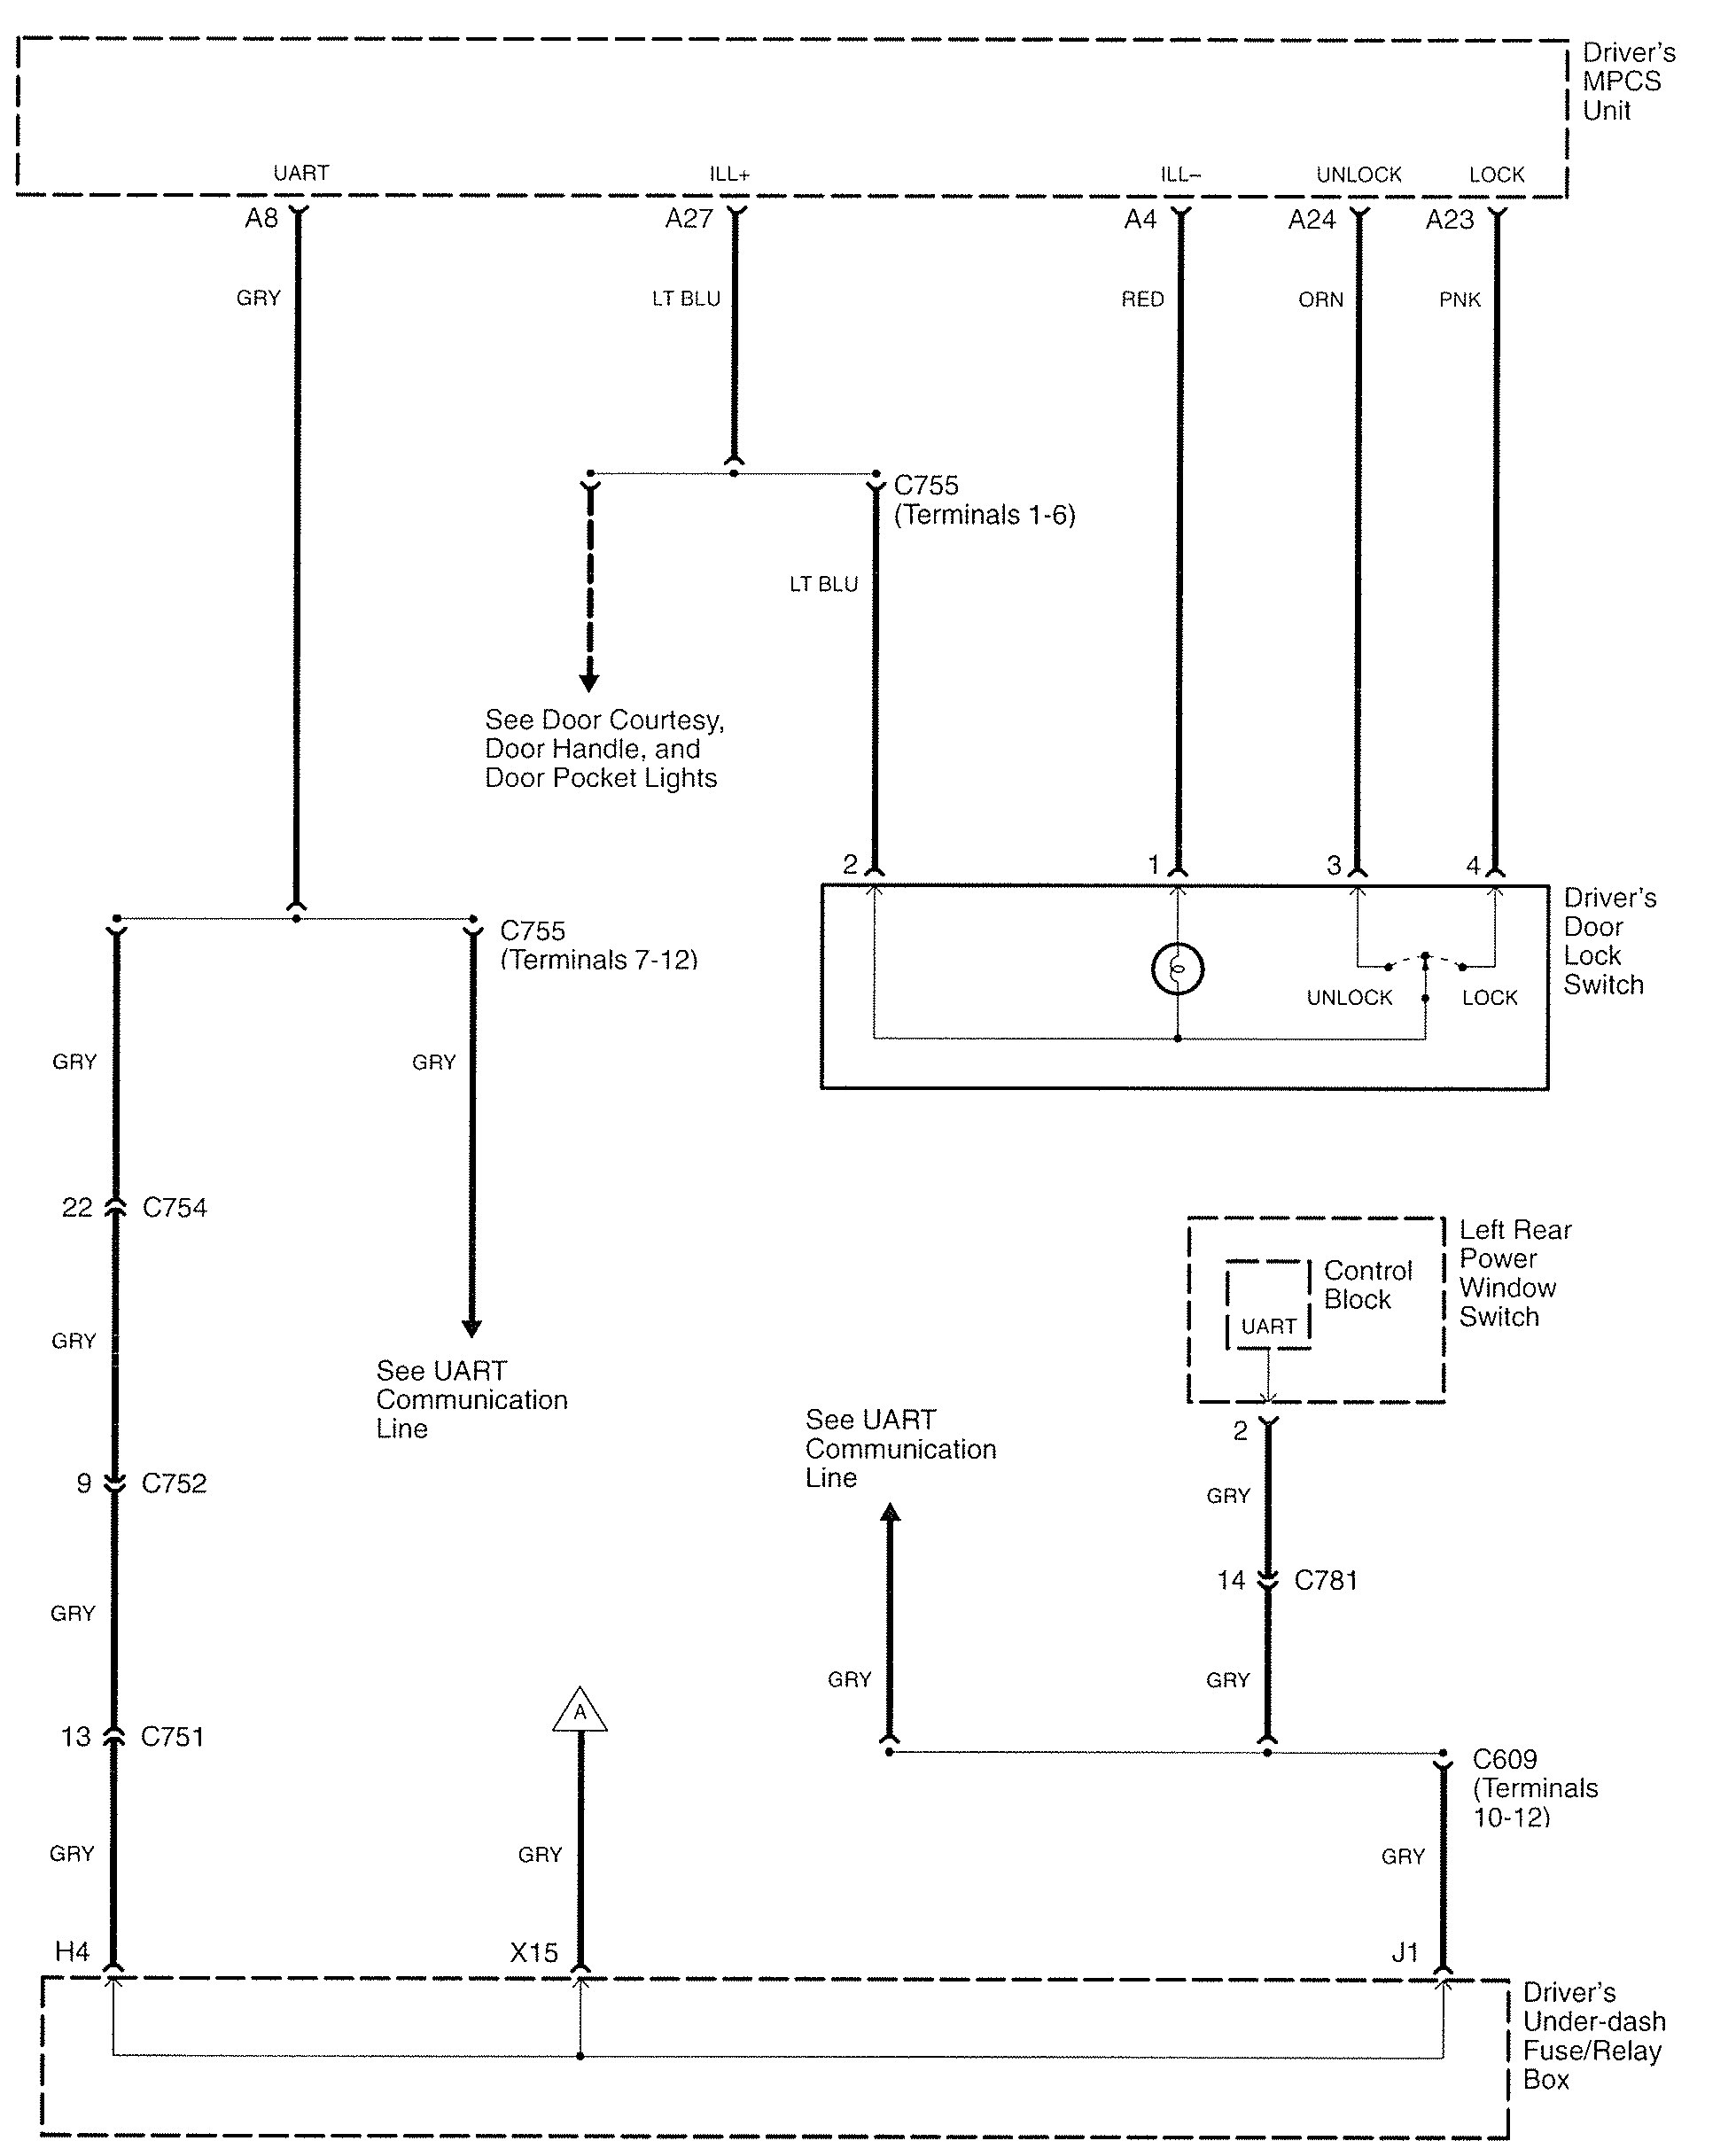 Astonishing Saab Wiring Diagrams Photos - ufc204.us - diagram ...